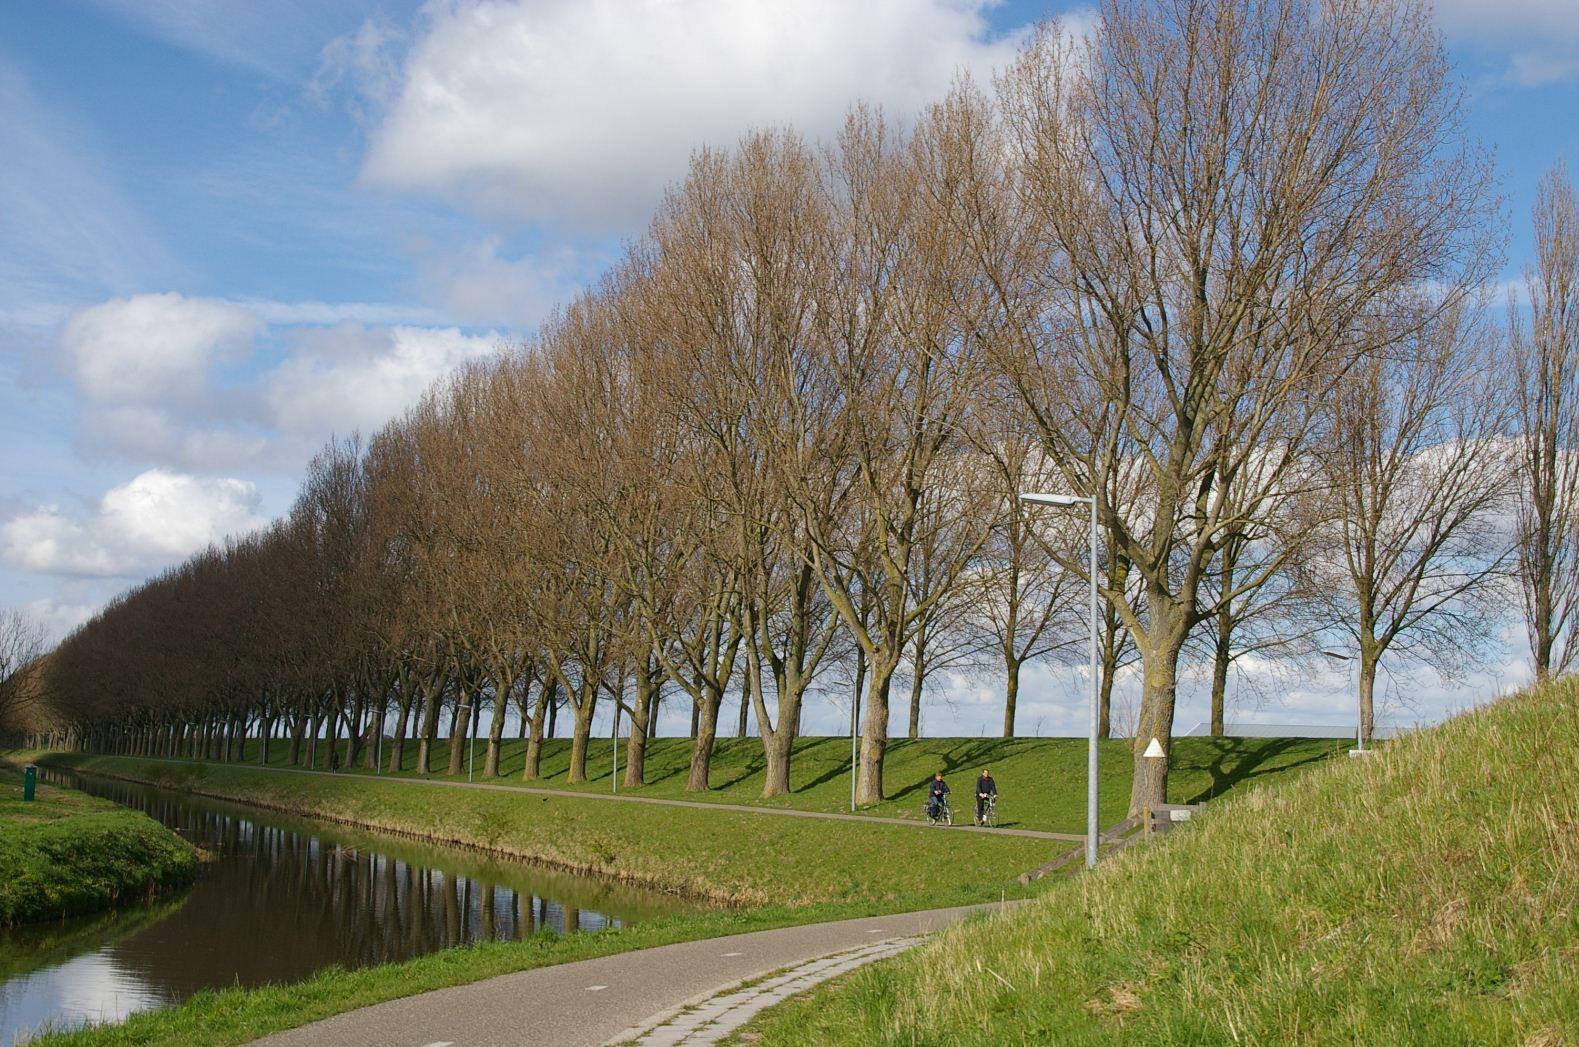 Geniedijk (Stelling van Amsterdam)